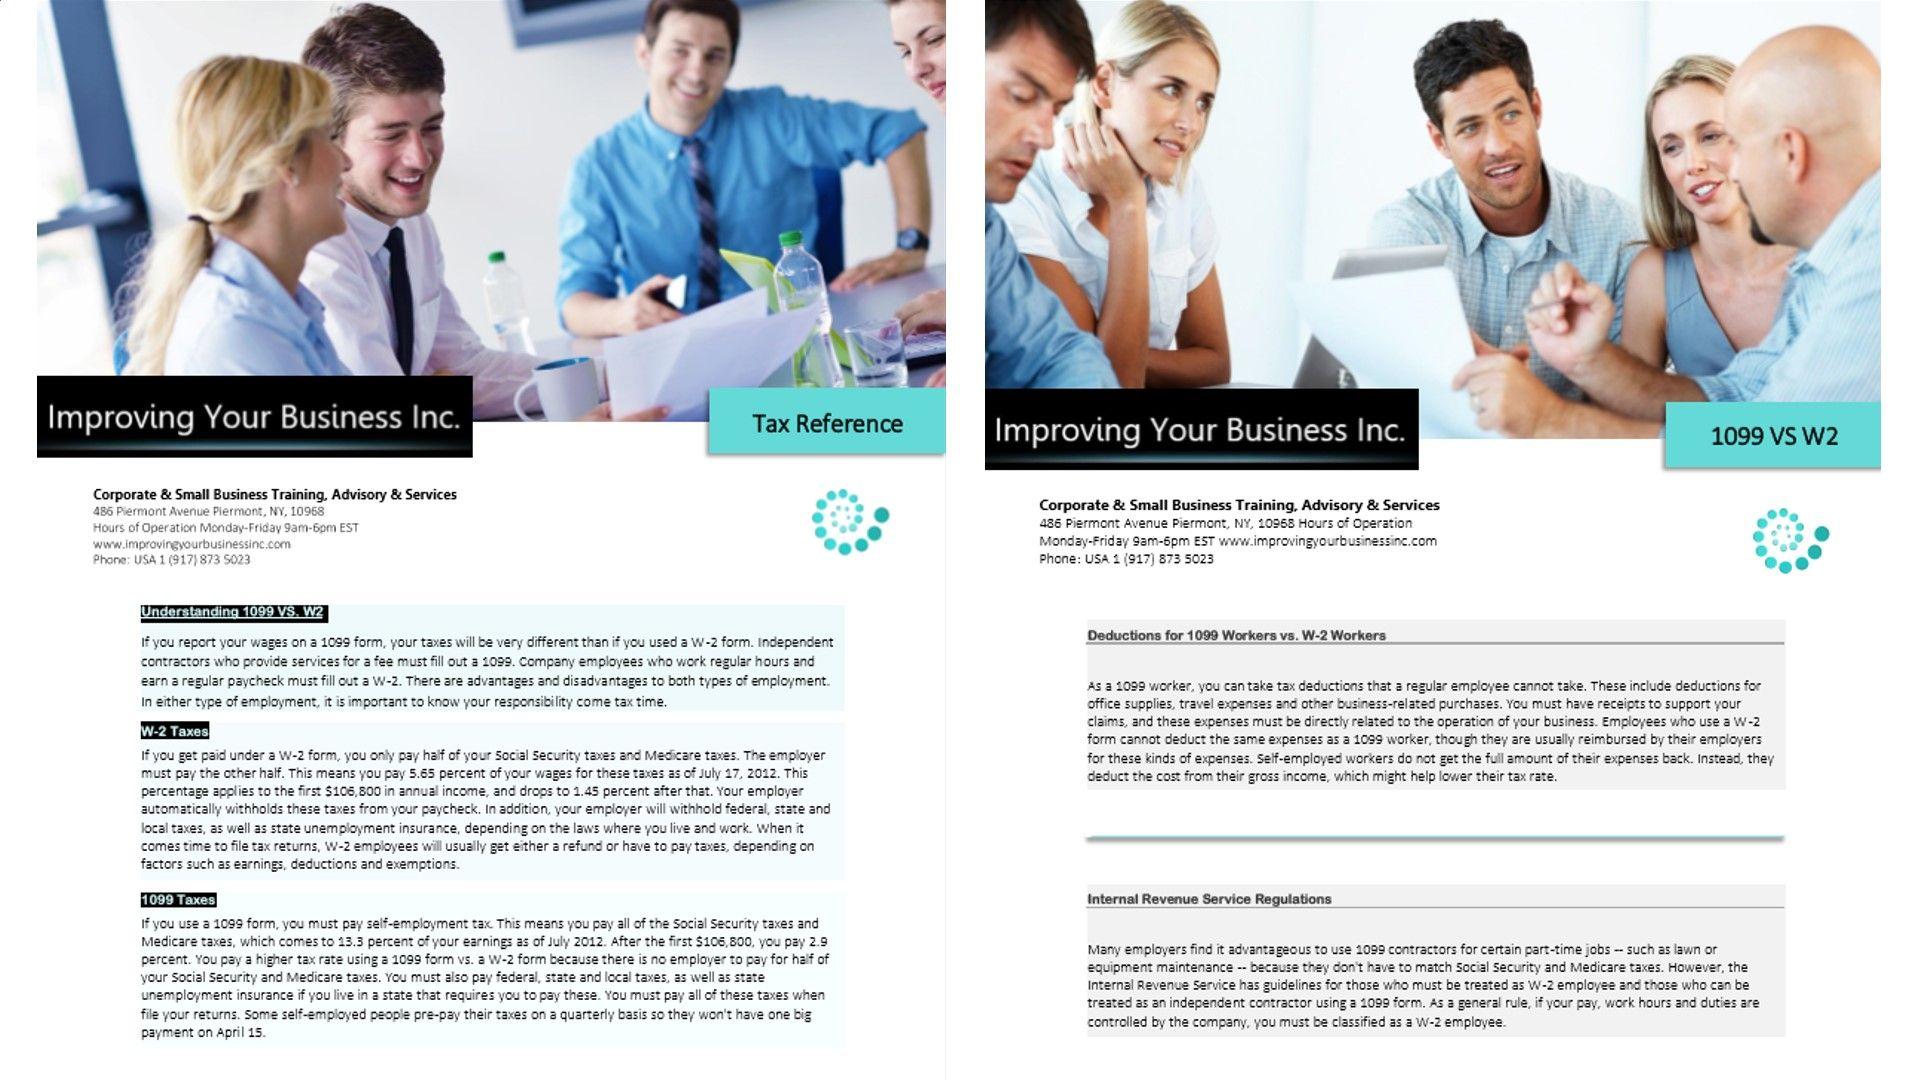 1099 vs w2 3 business segments training development consulting